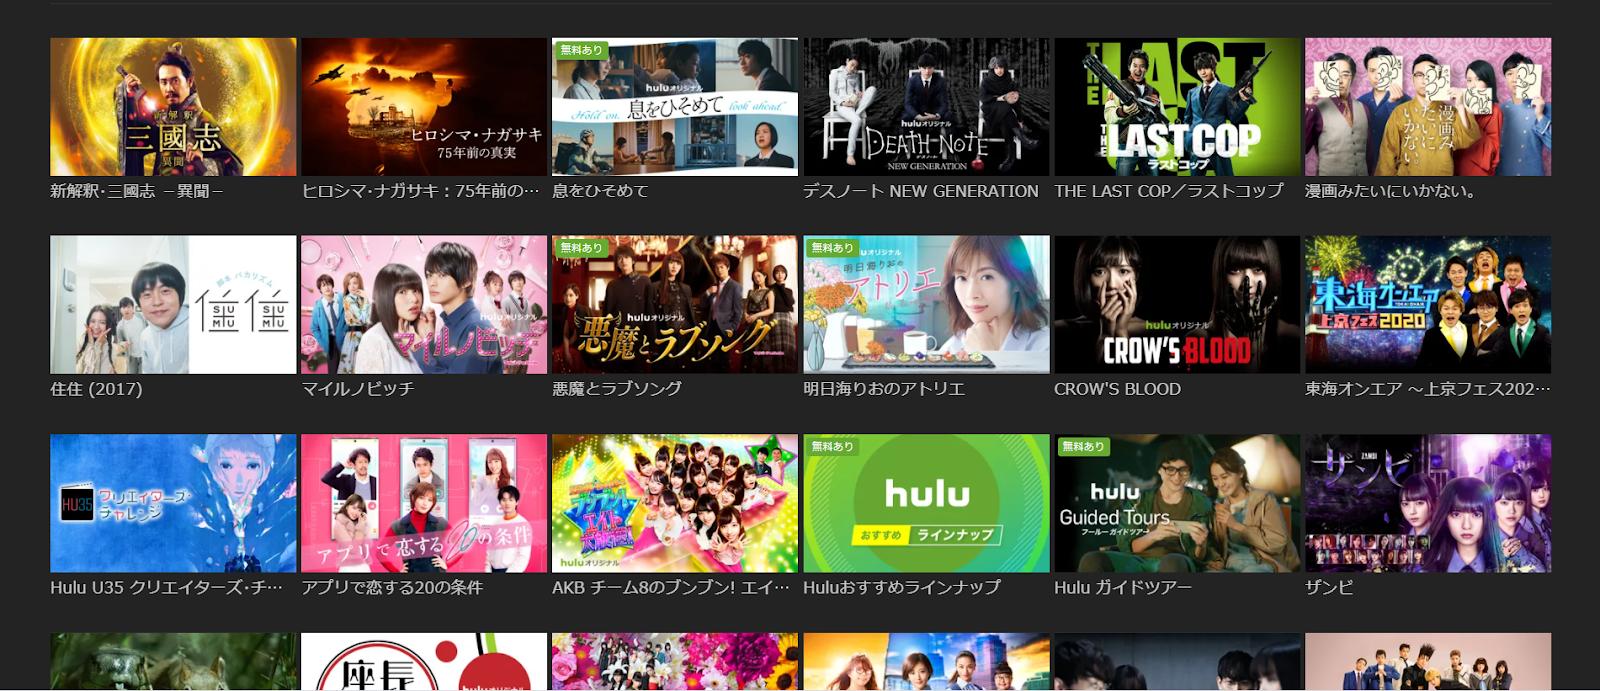 Huluオリジナル作品ランキングTOP10を徹底解説【2021年6月】